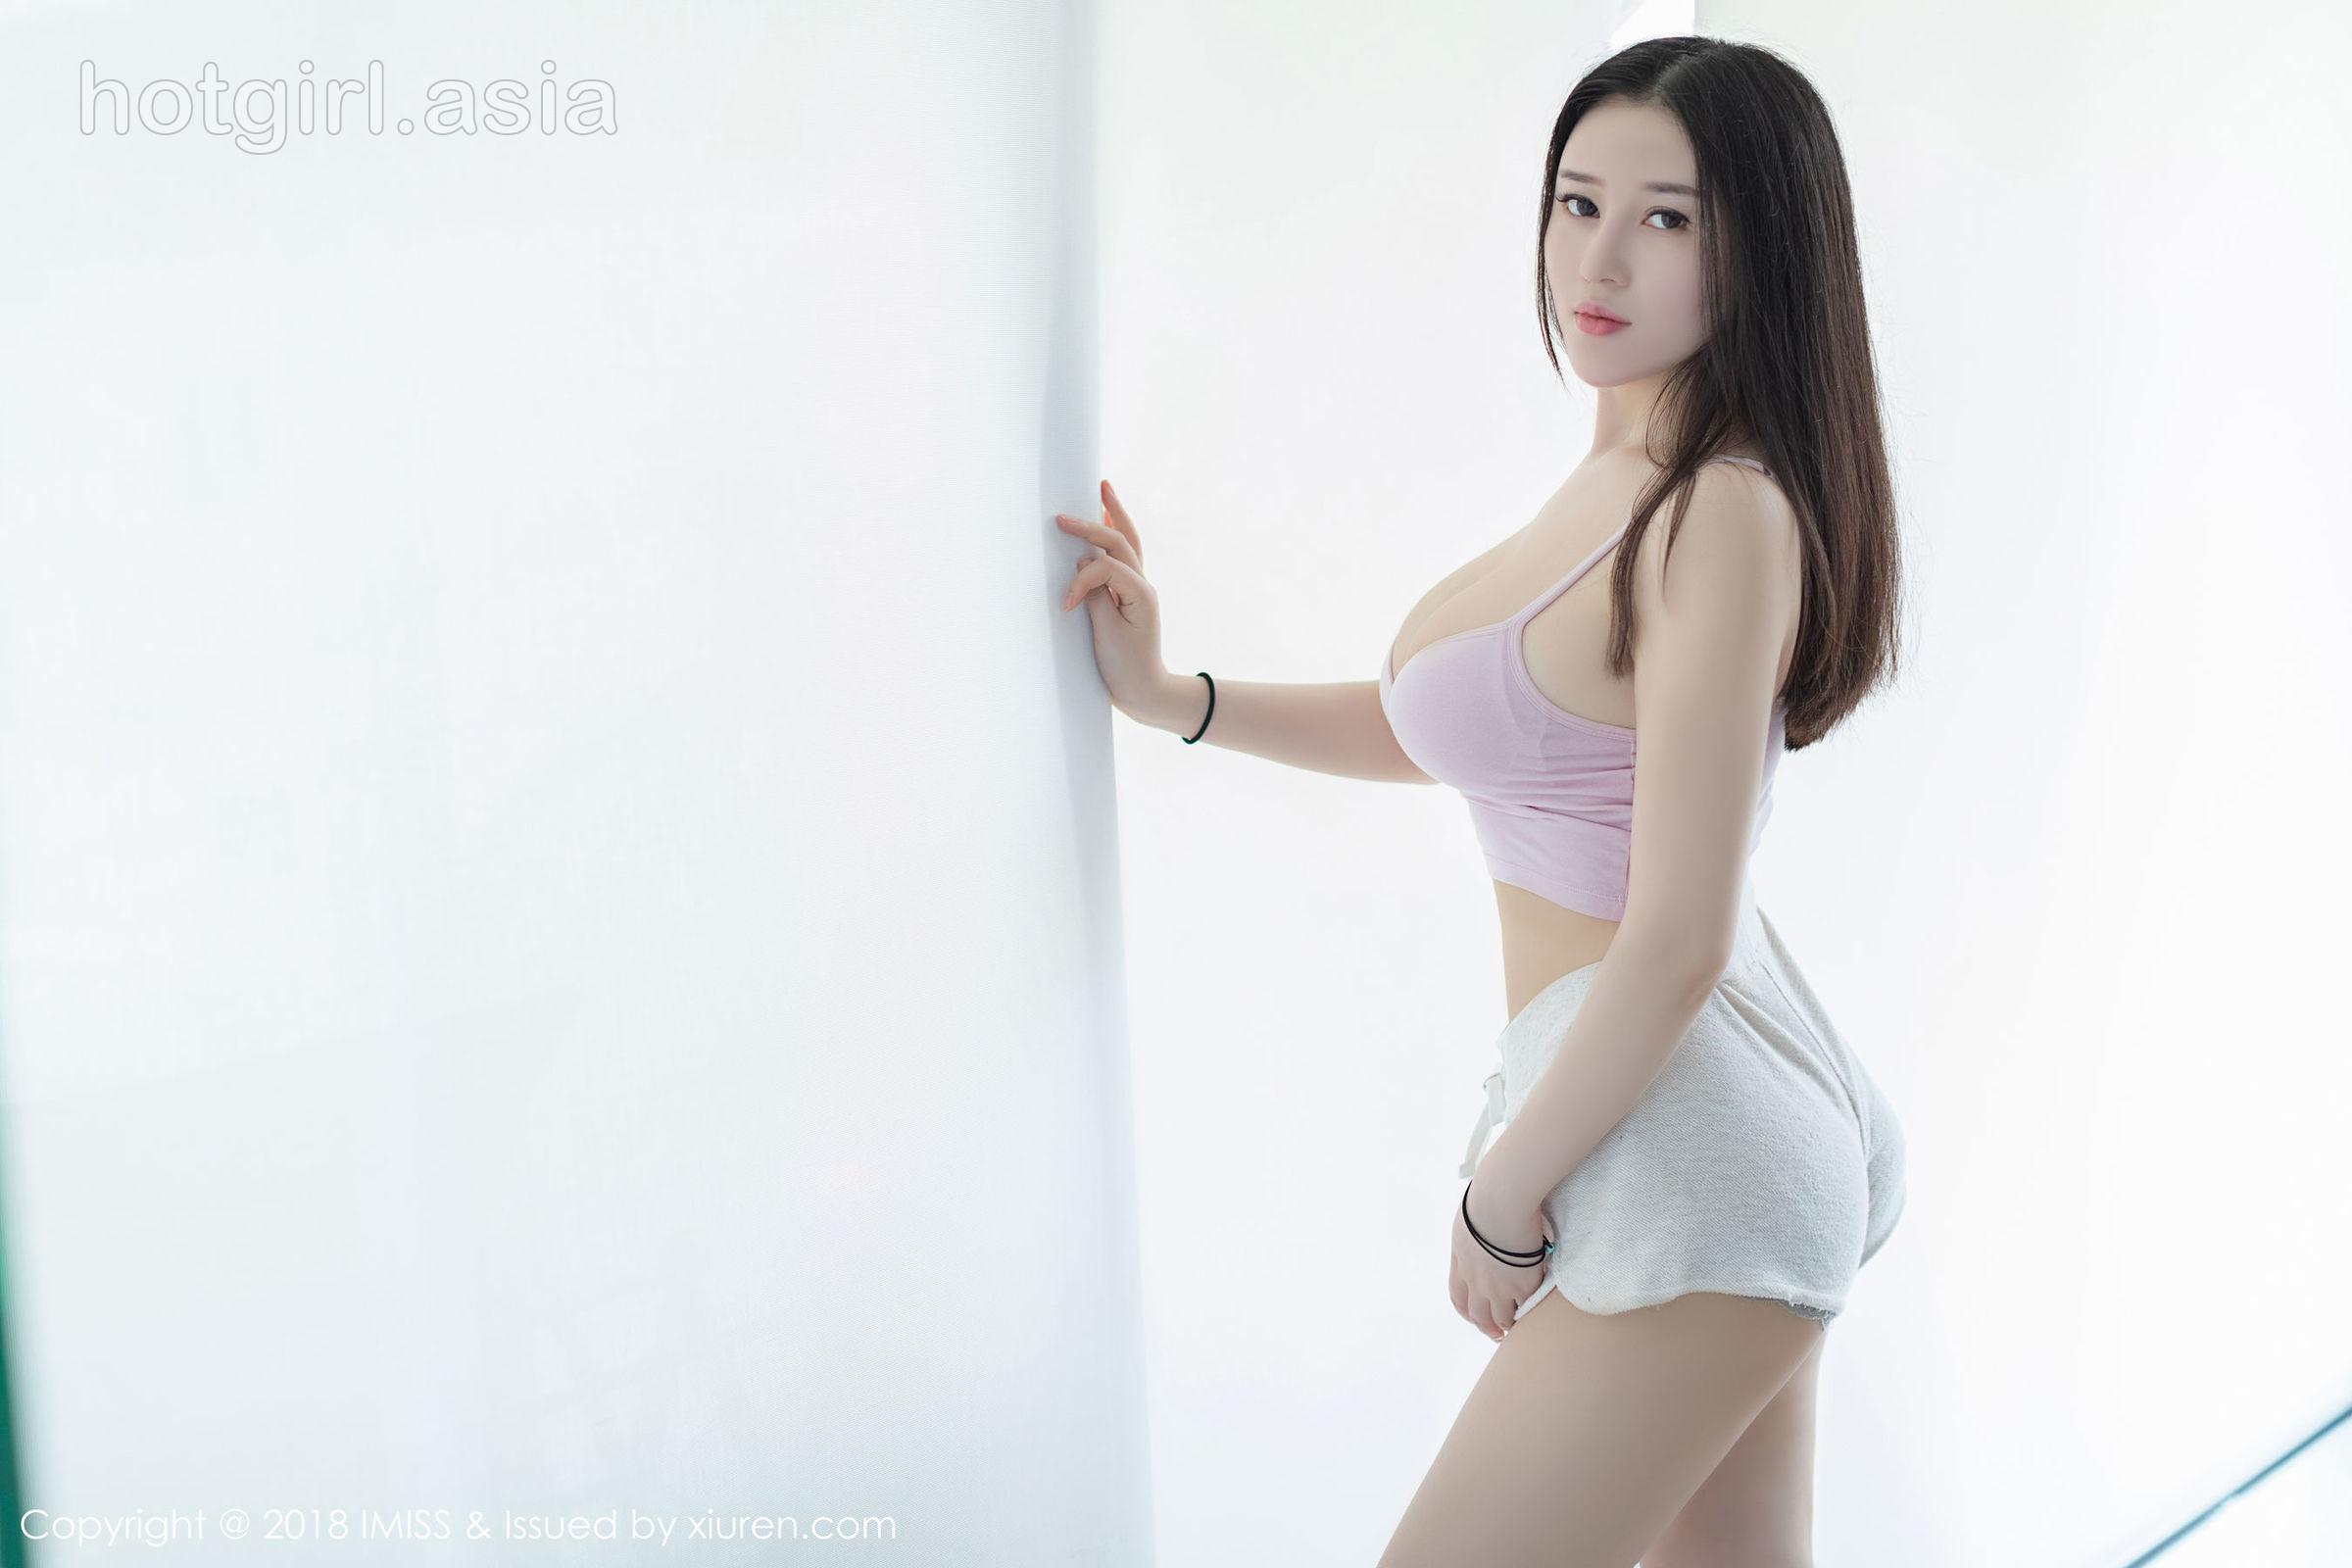 [IMiss 爱 蜜 社] Vol.298 Big breast goddess @ 恩 一 Phuket Island travel photo